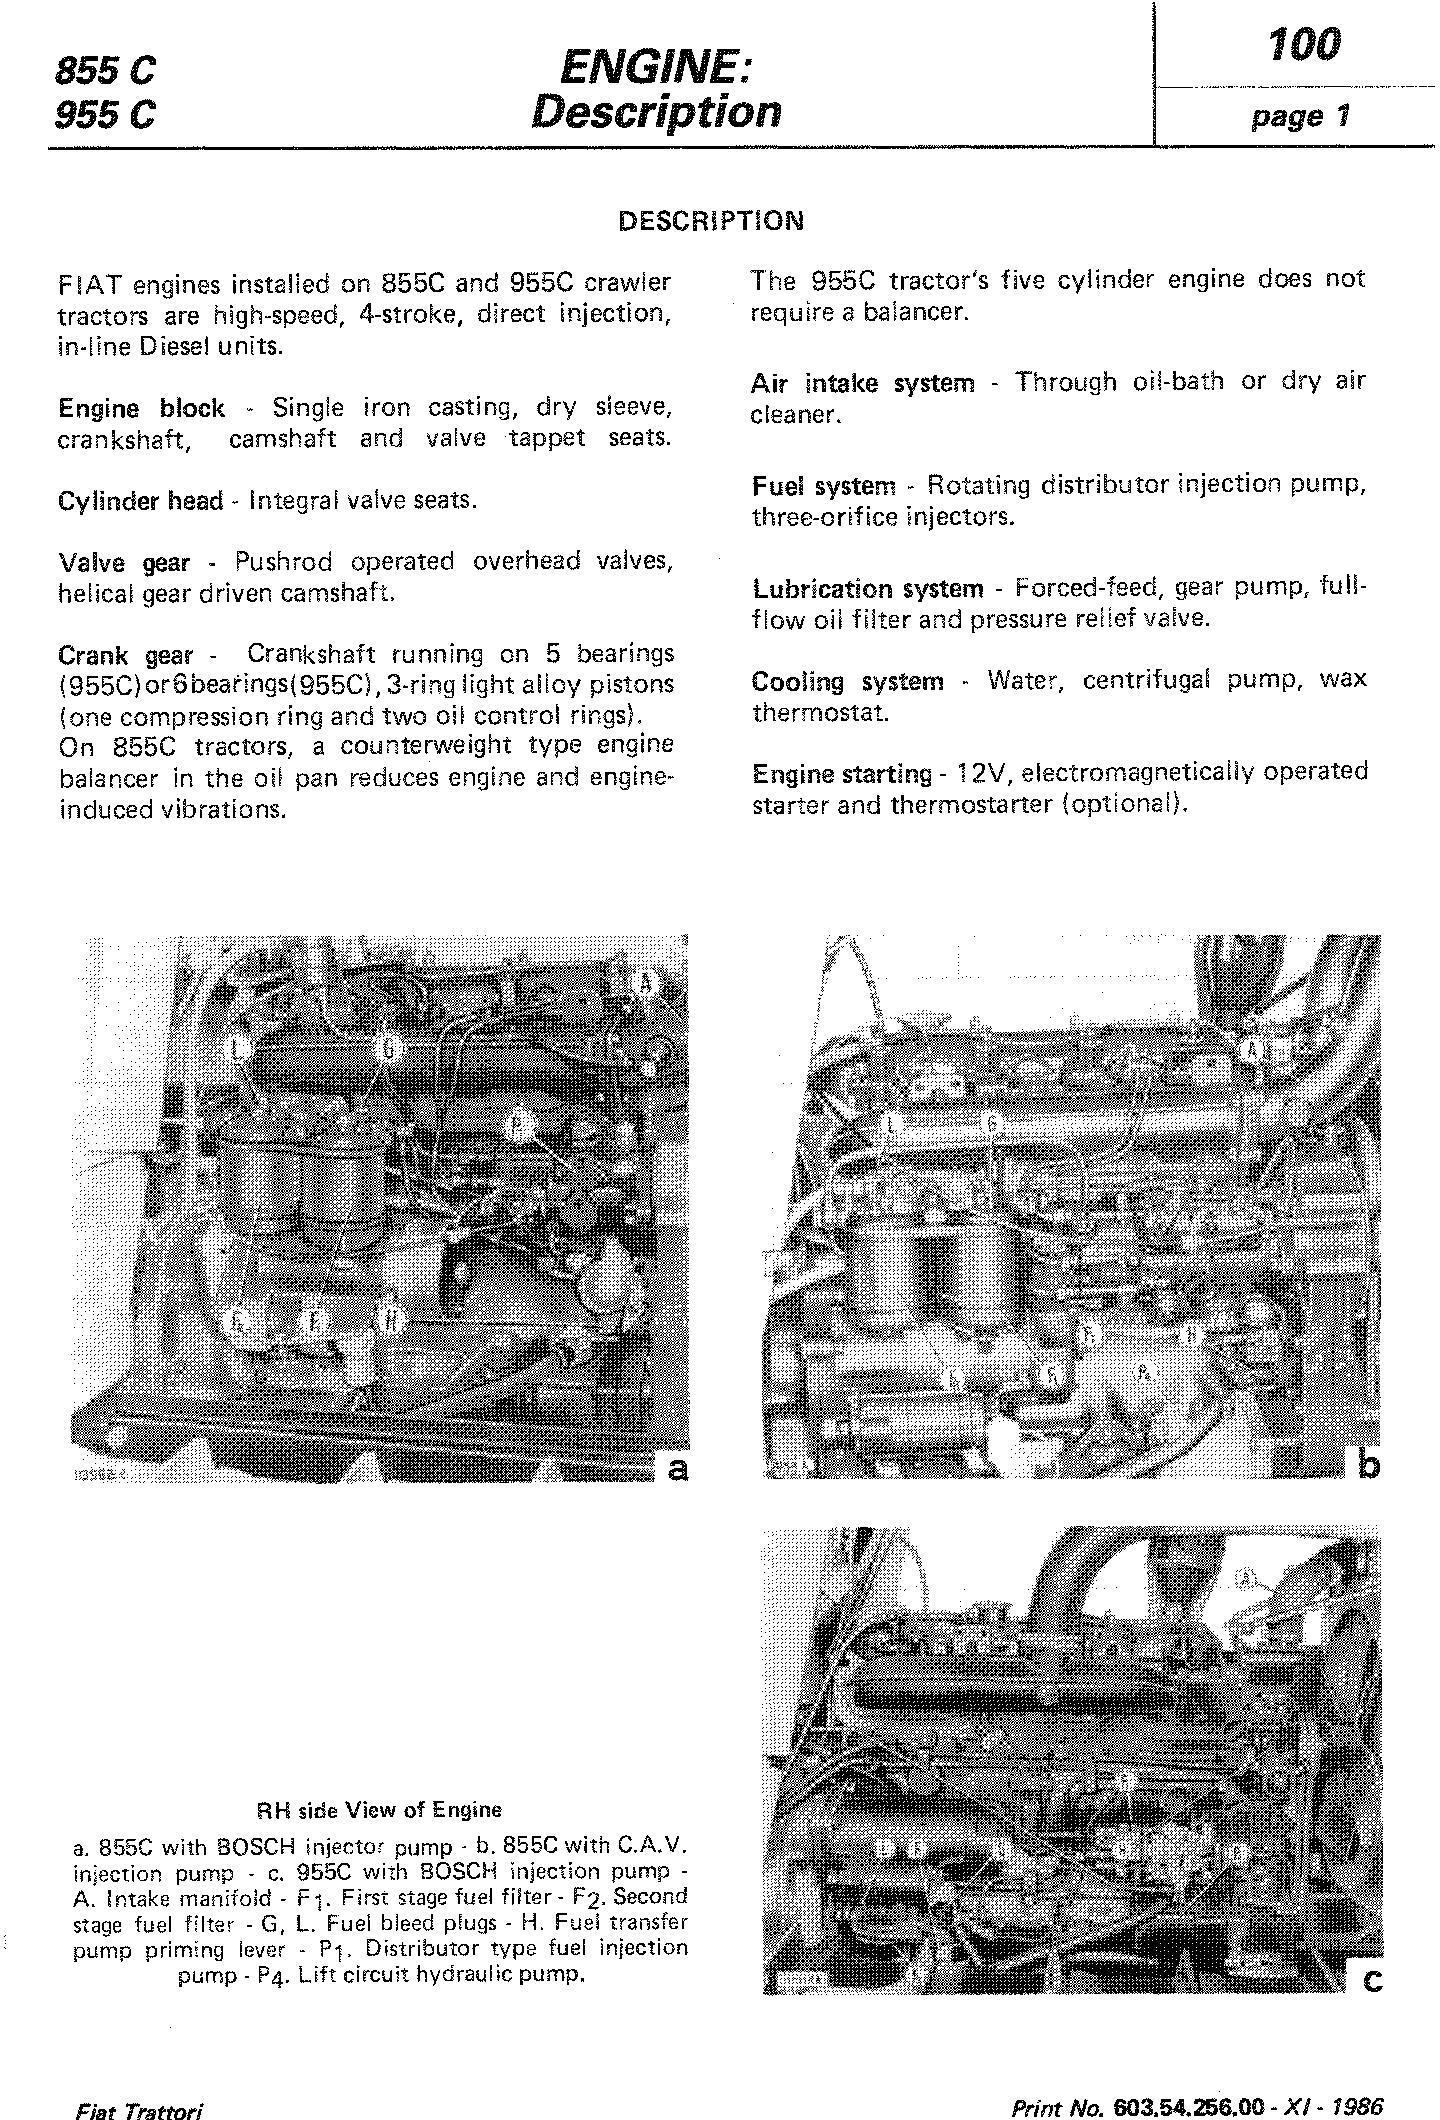 Fiat 855C, 955C, 85-55, 95-55 Crawler Tractor Workshop Service Manual (6035425600) - 3